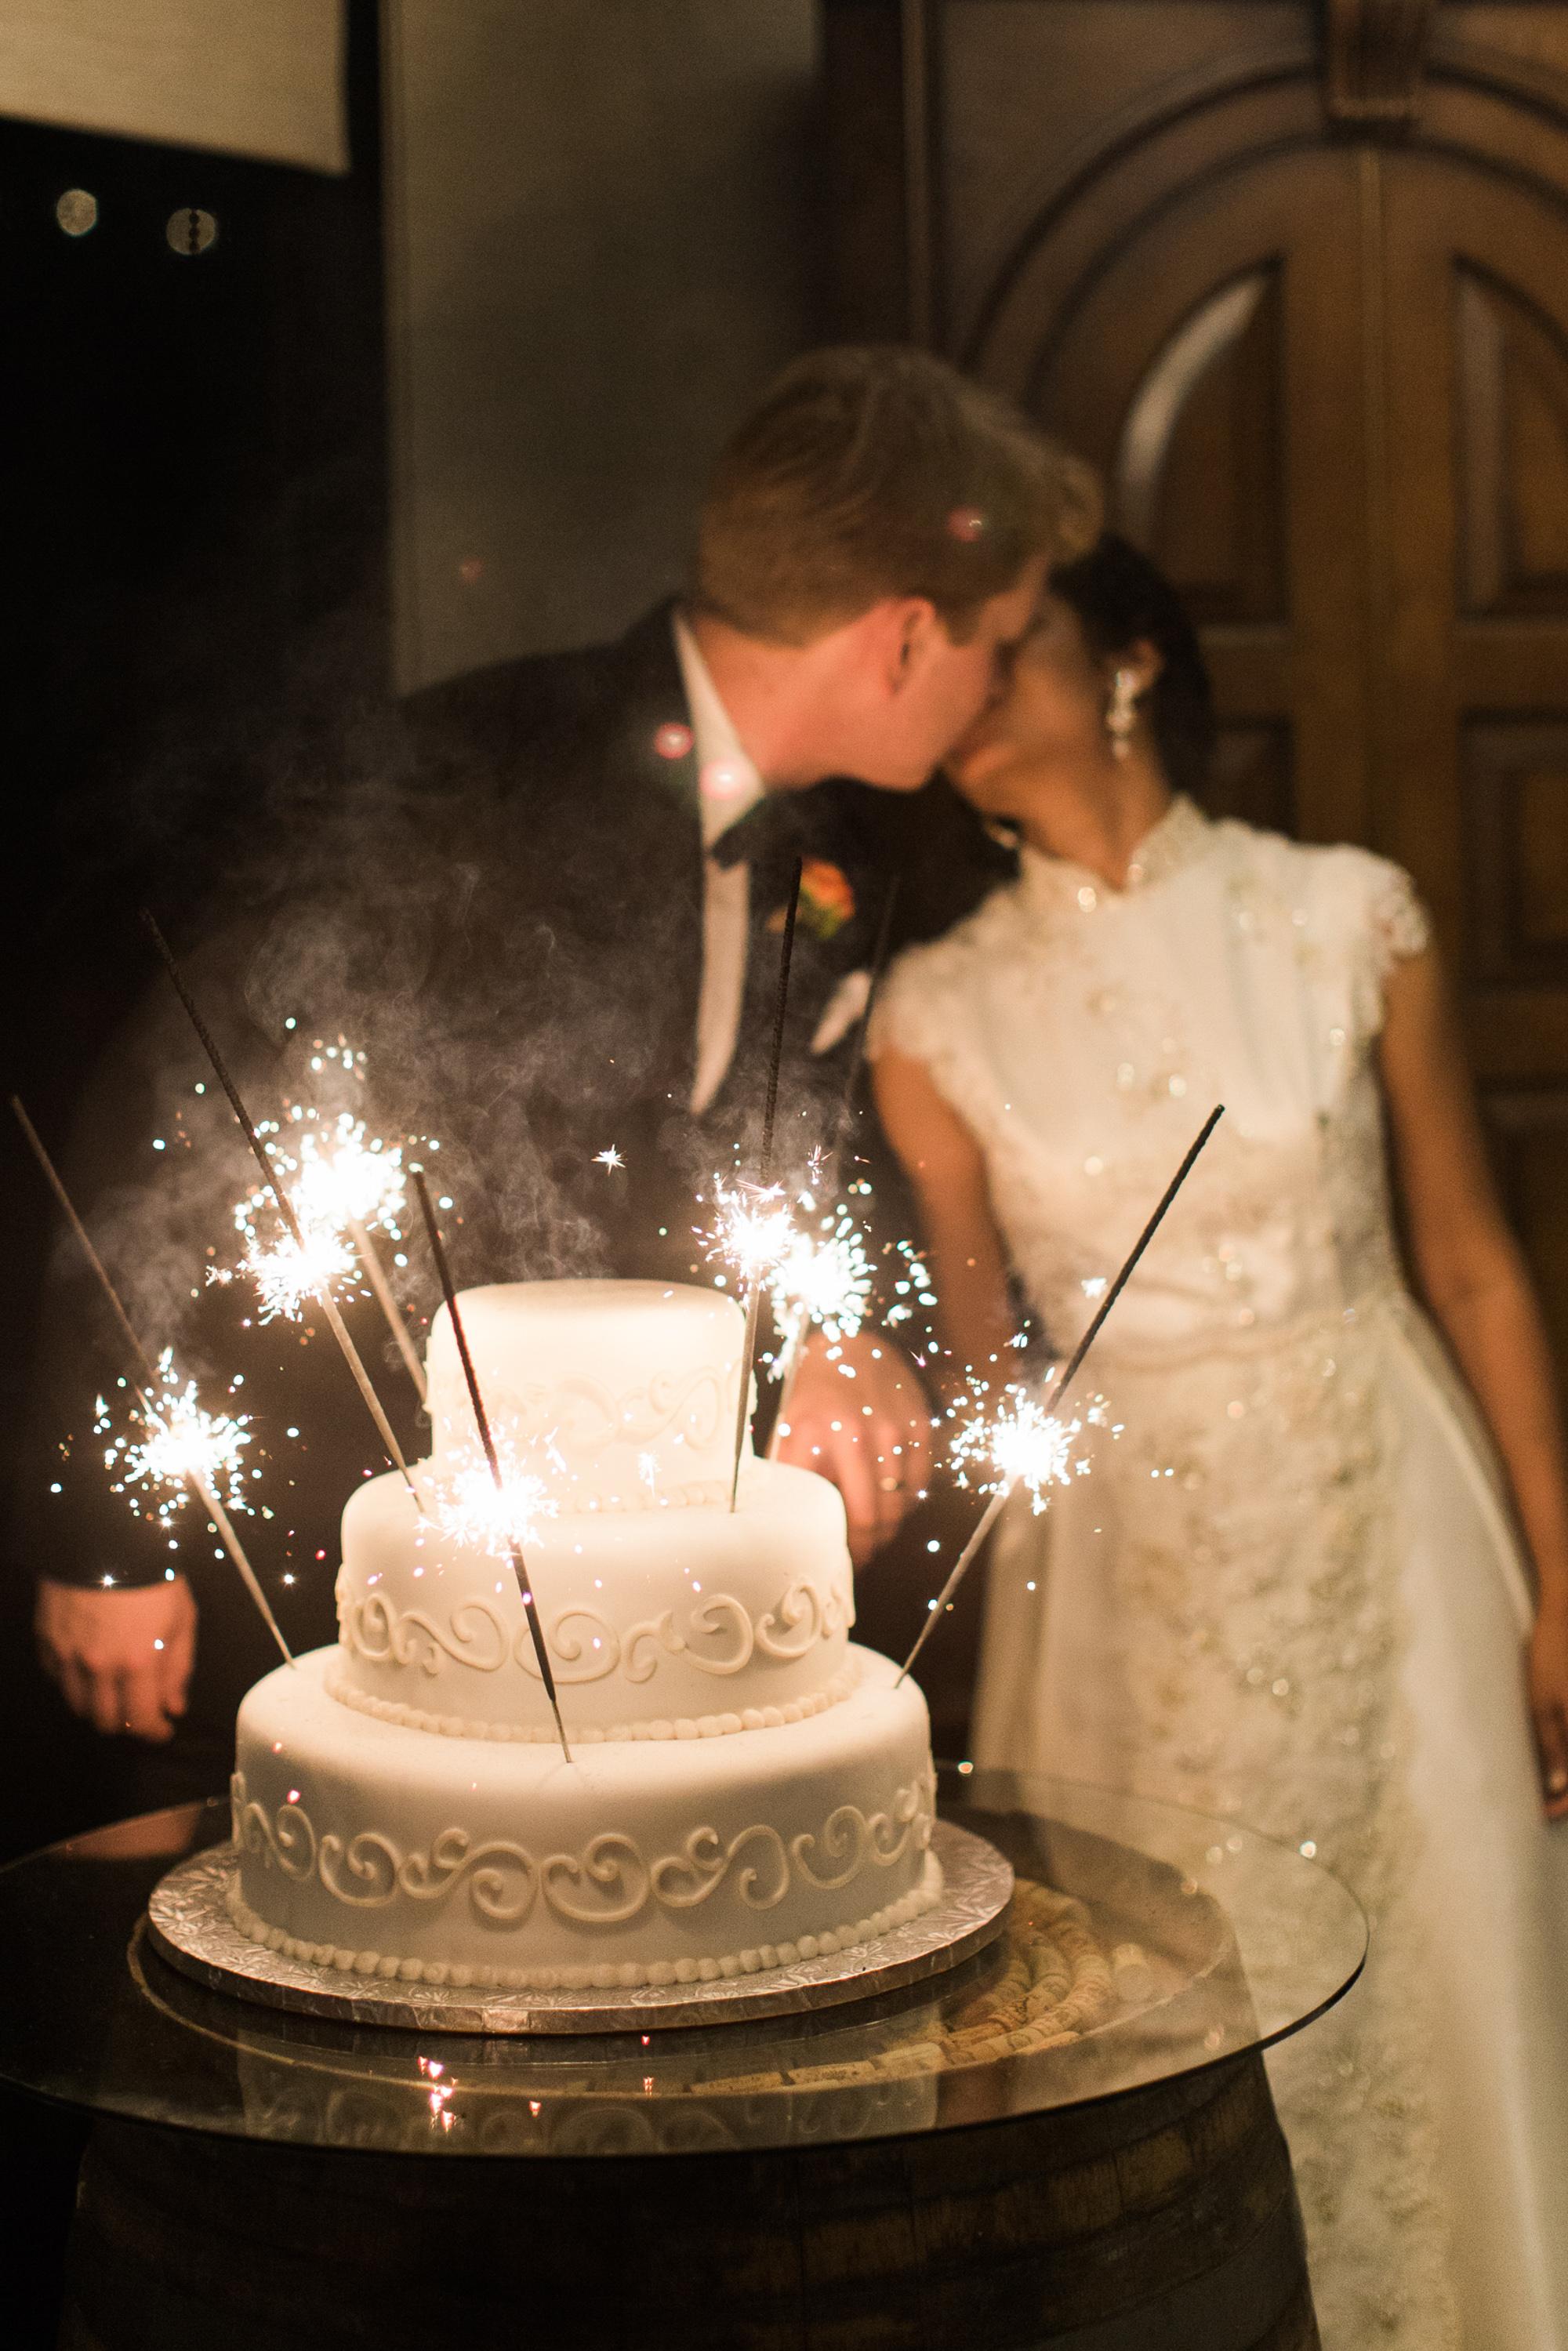 7b333-messina-hof-wedding-57messina-hof-wedding-57.jpg